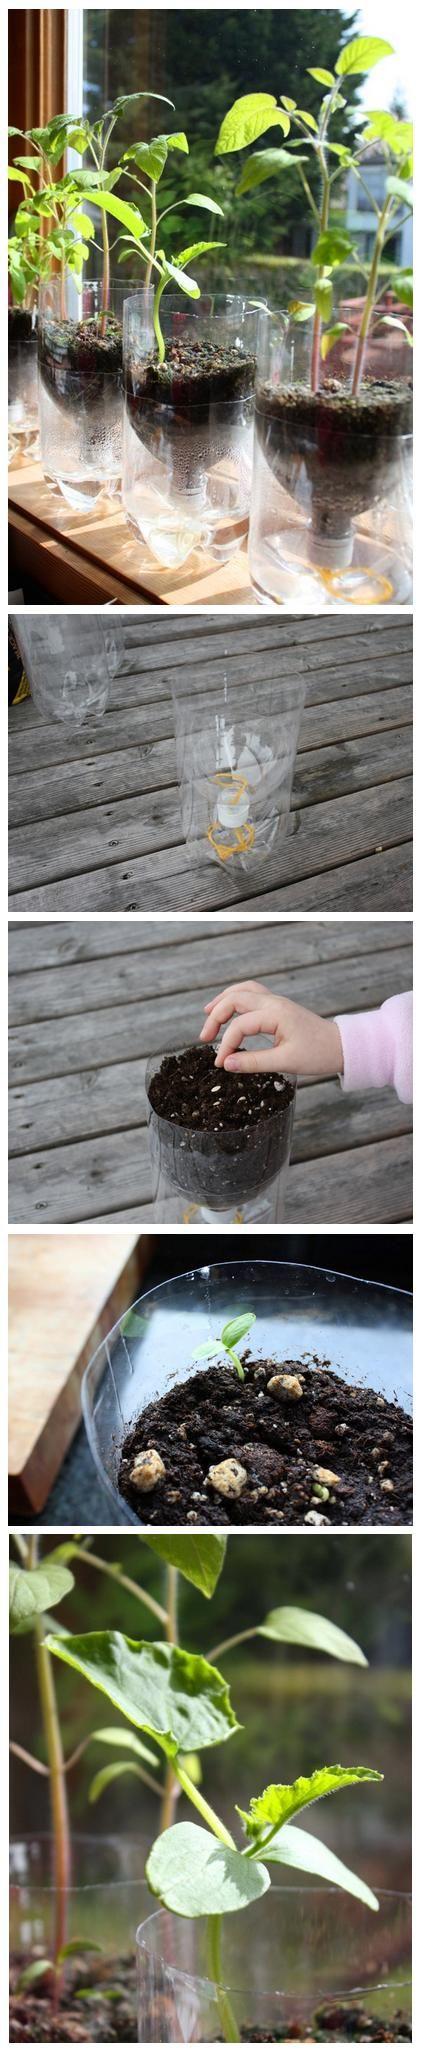 Self-Watering Seed Starter Pots | World In Green